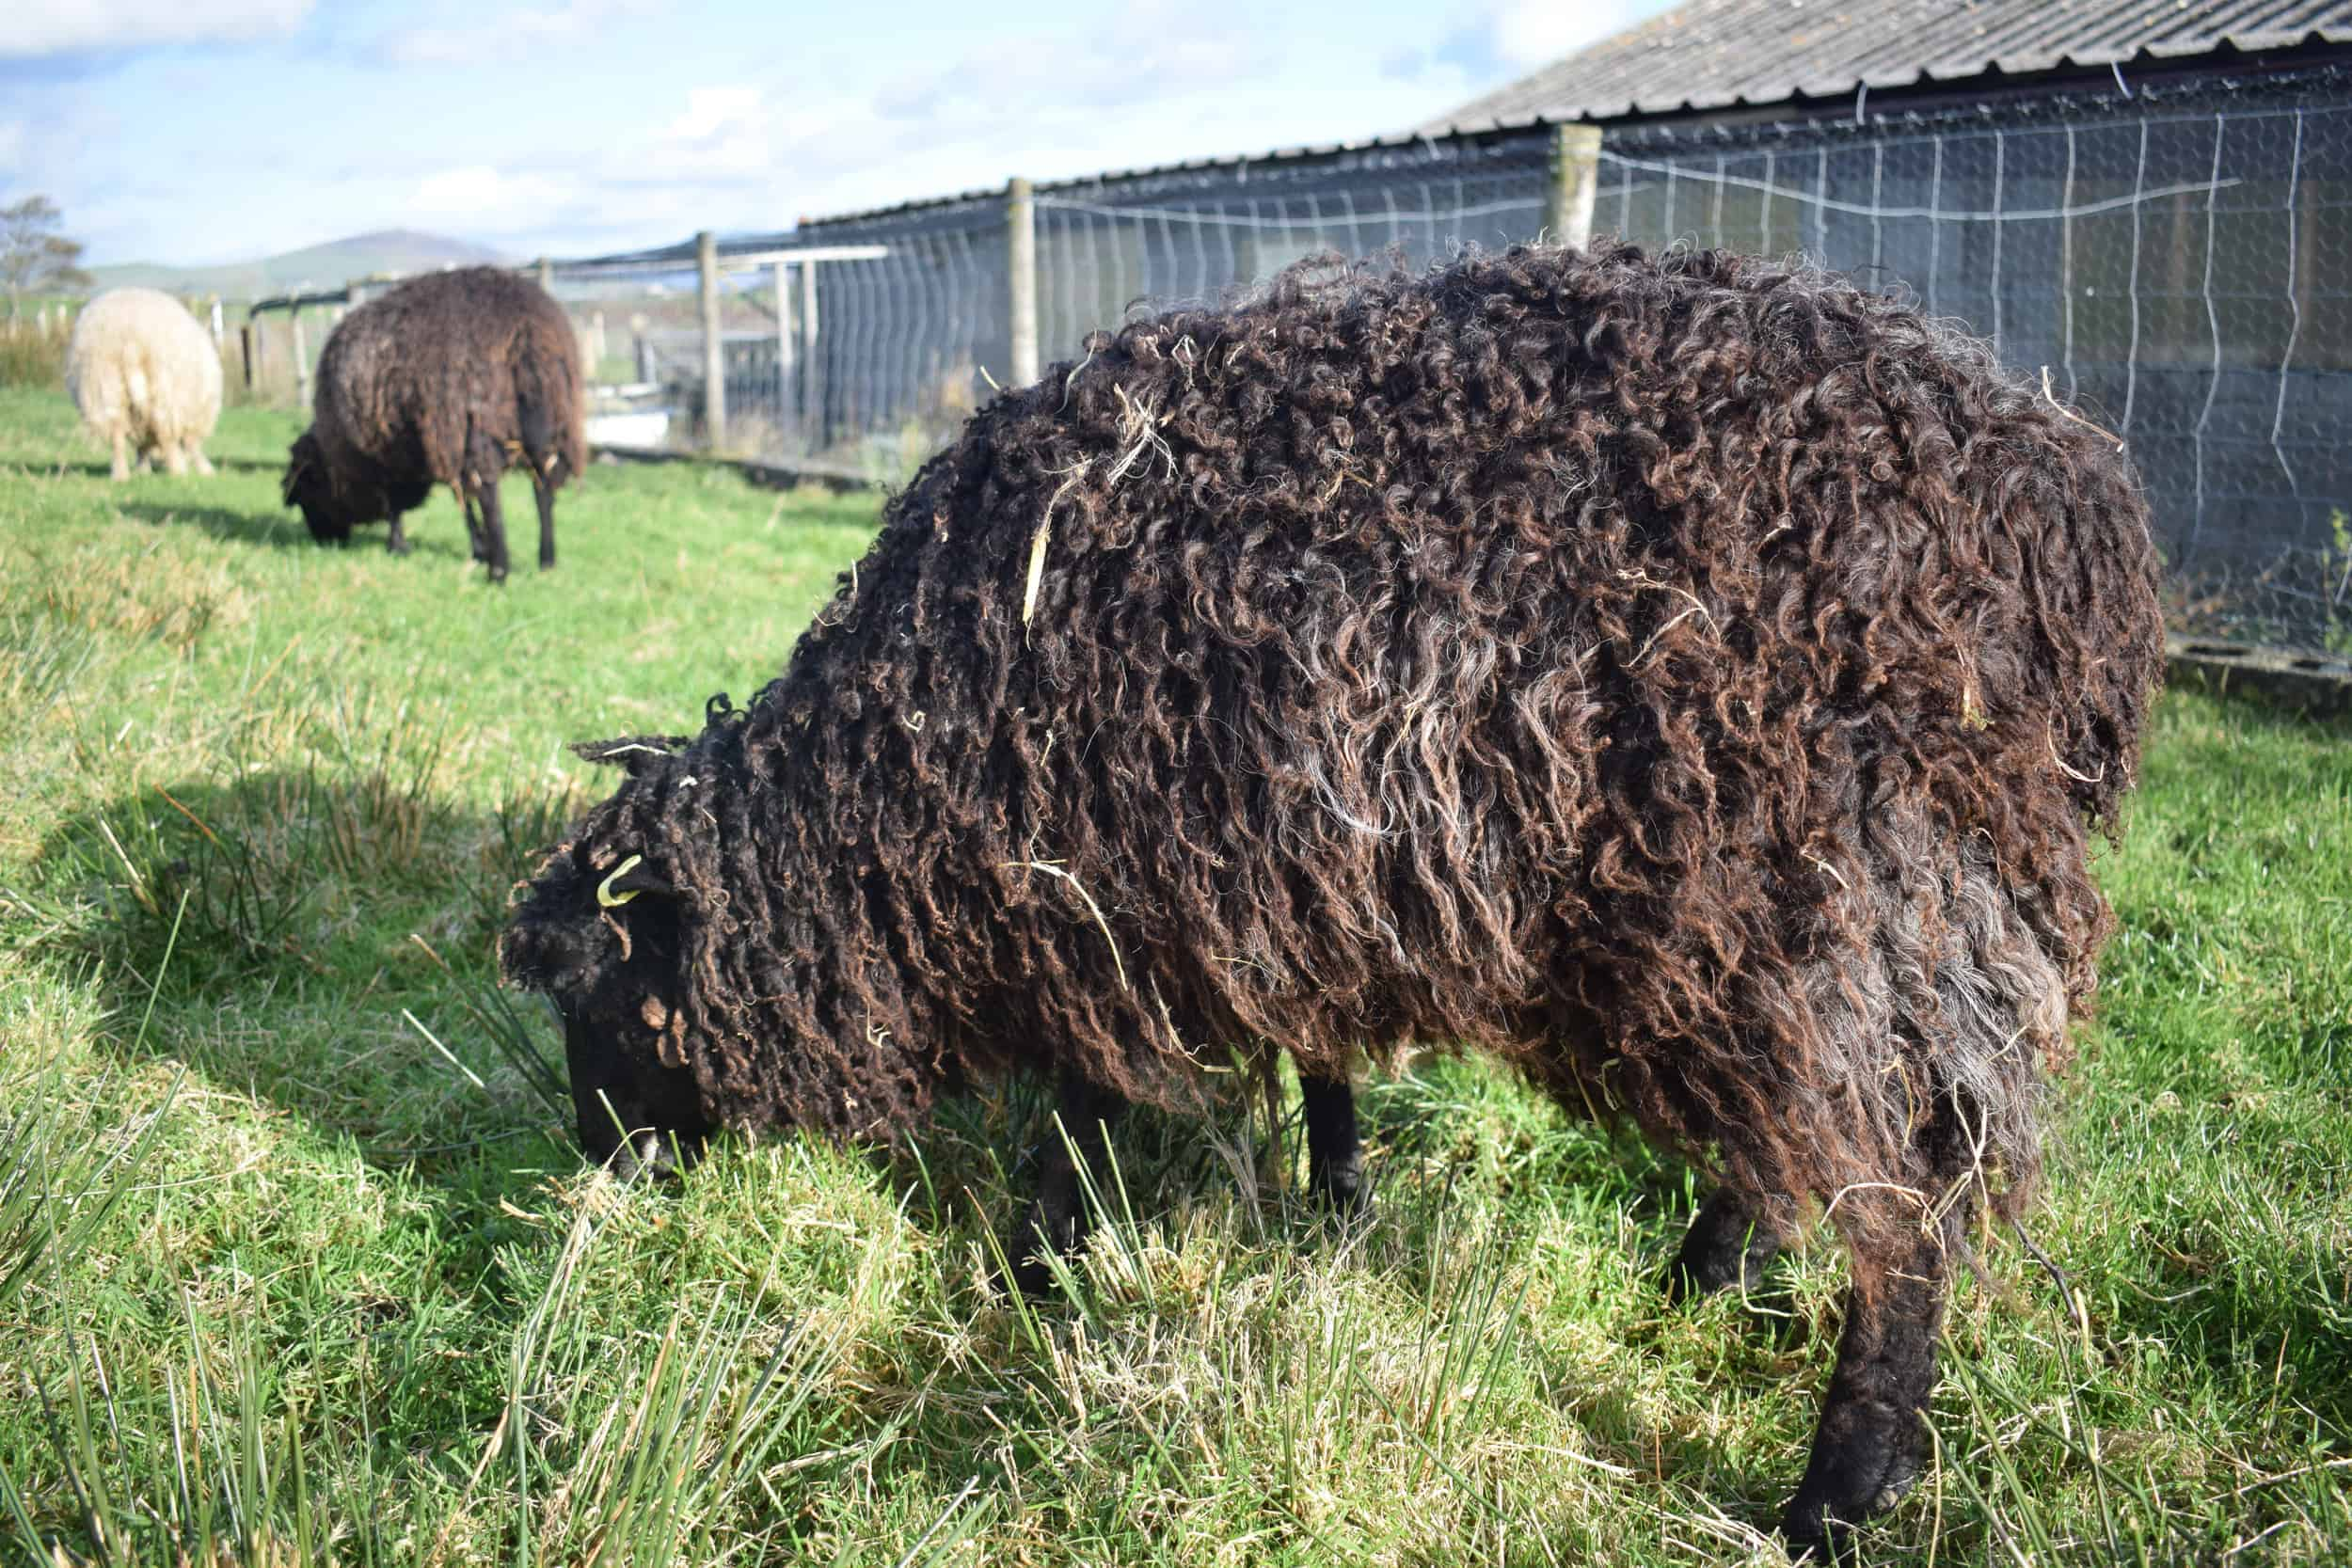 Tatty longwool lamb races coloured leicester longwool shetland gotland sheep ewe lamb kind fibre sheep frendly ethical wool products cross fleece